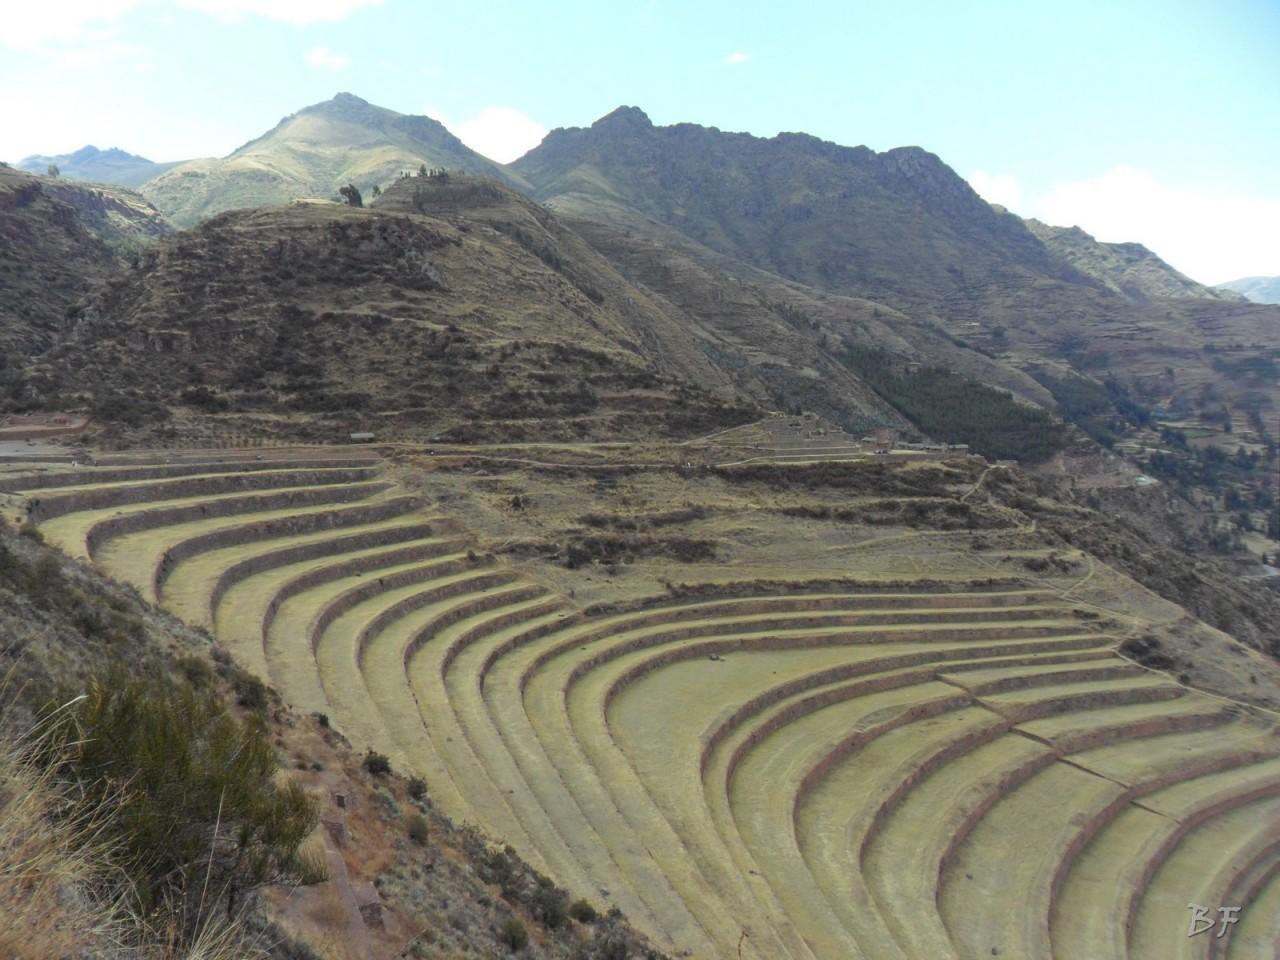 Mura-Poligonali-Megaliti-Altari-Rupestri-Pisac-Cusco-Perù-34